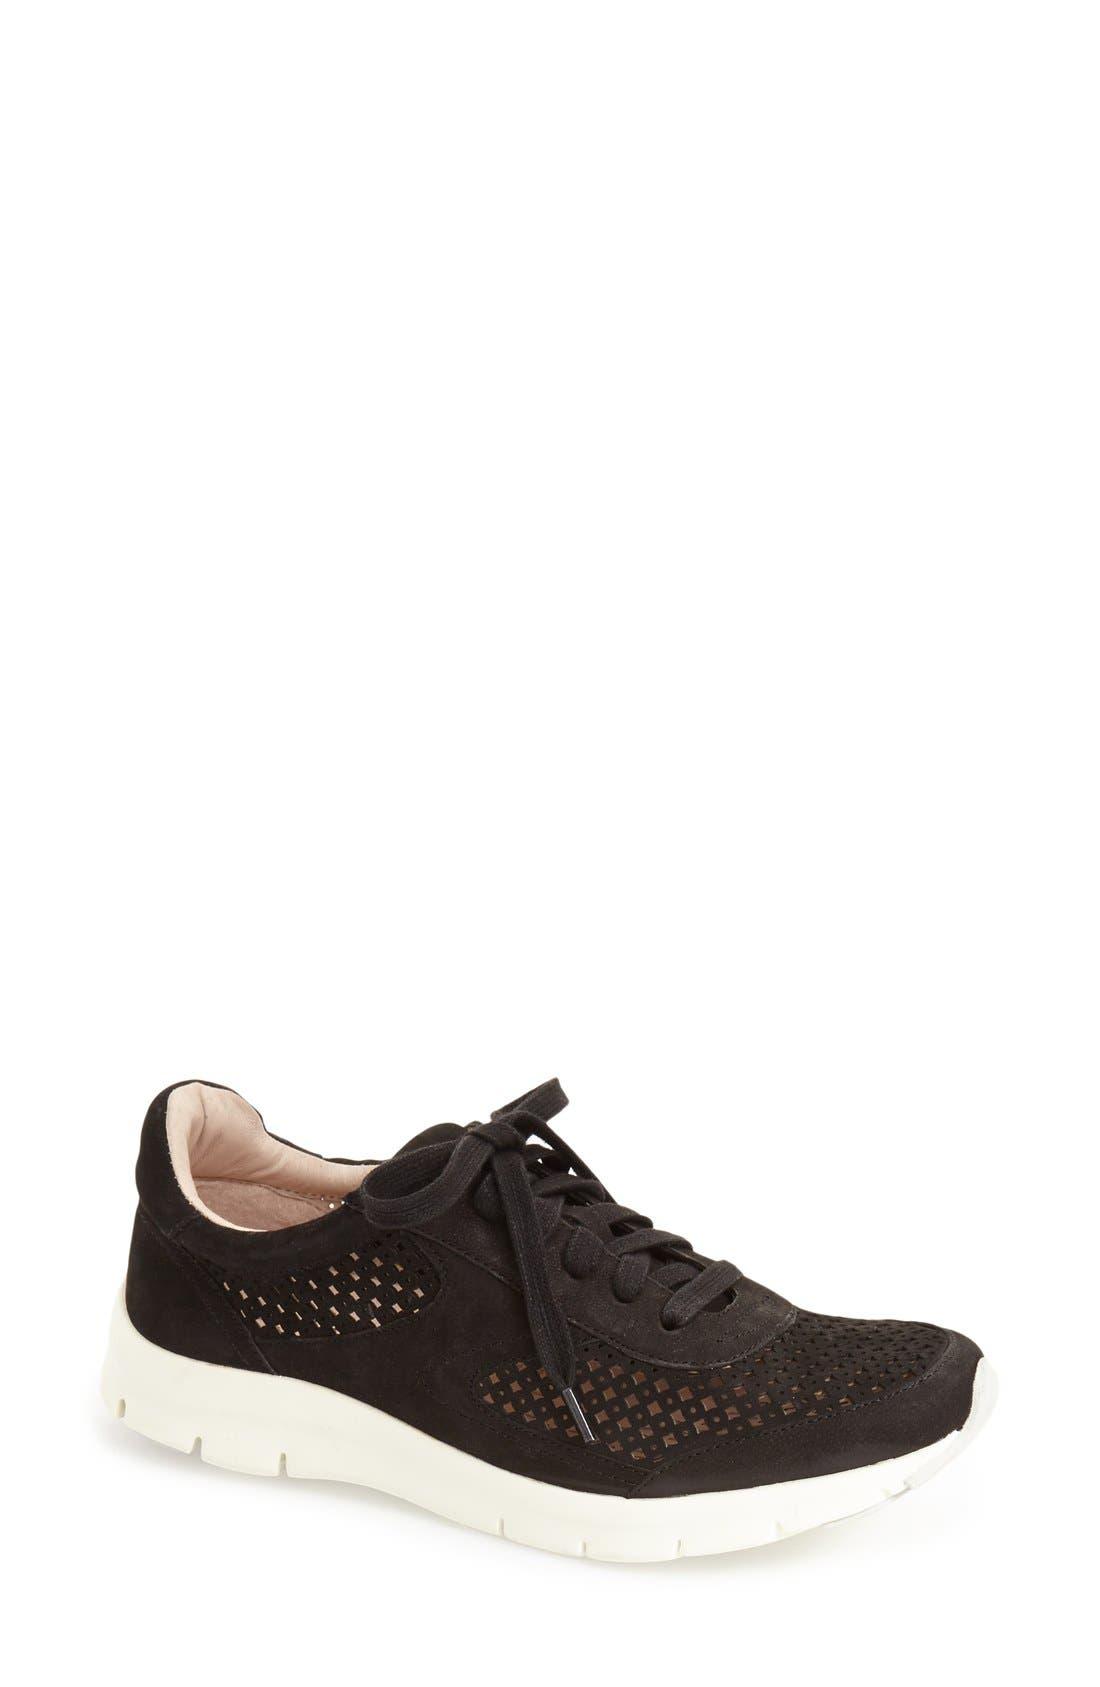 Sudini 'Tammi' Perforated Leather Sneaker (Women)